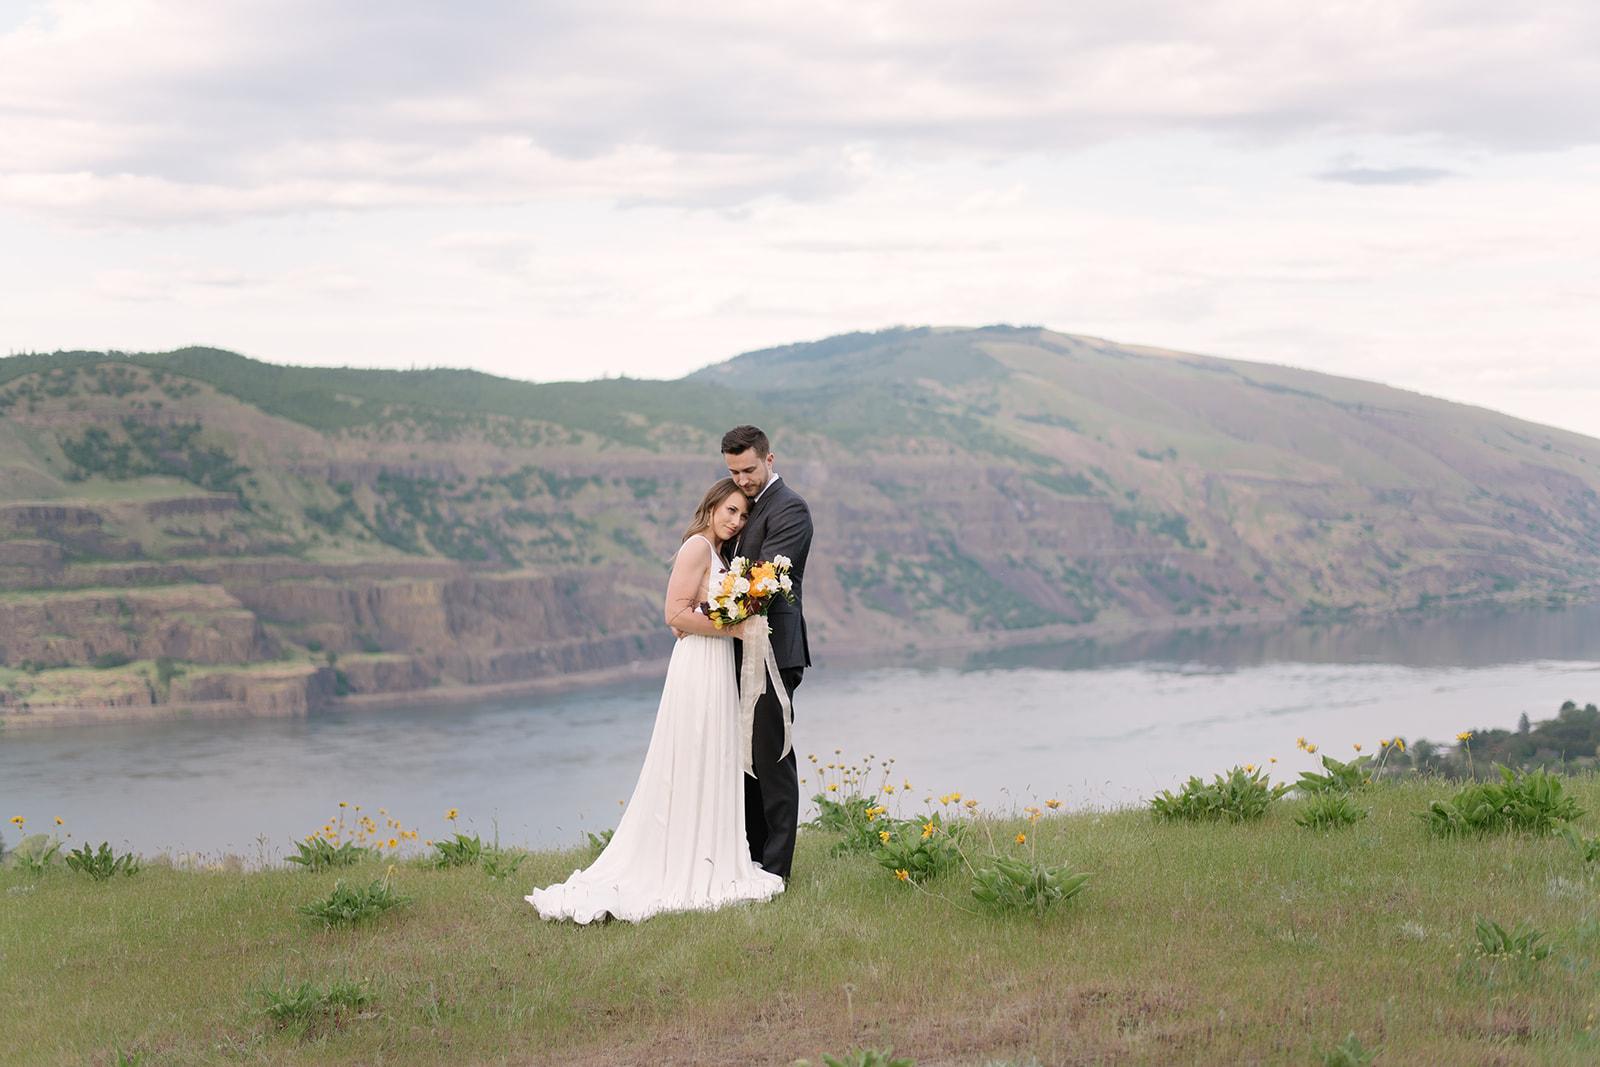 kamea_events_wedding_planner_portland_DeusAmor07.jpg